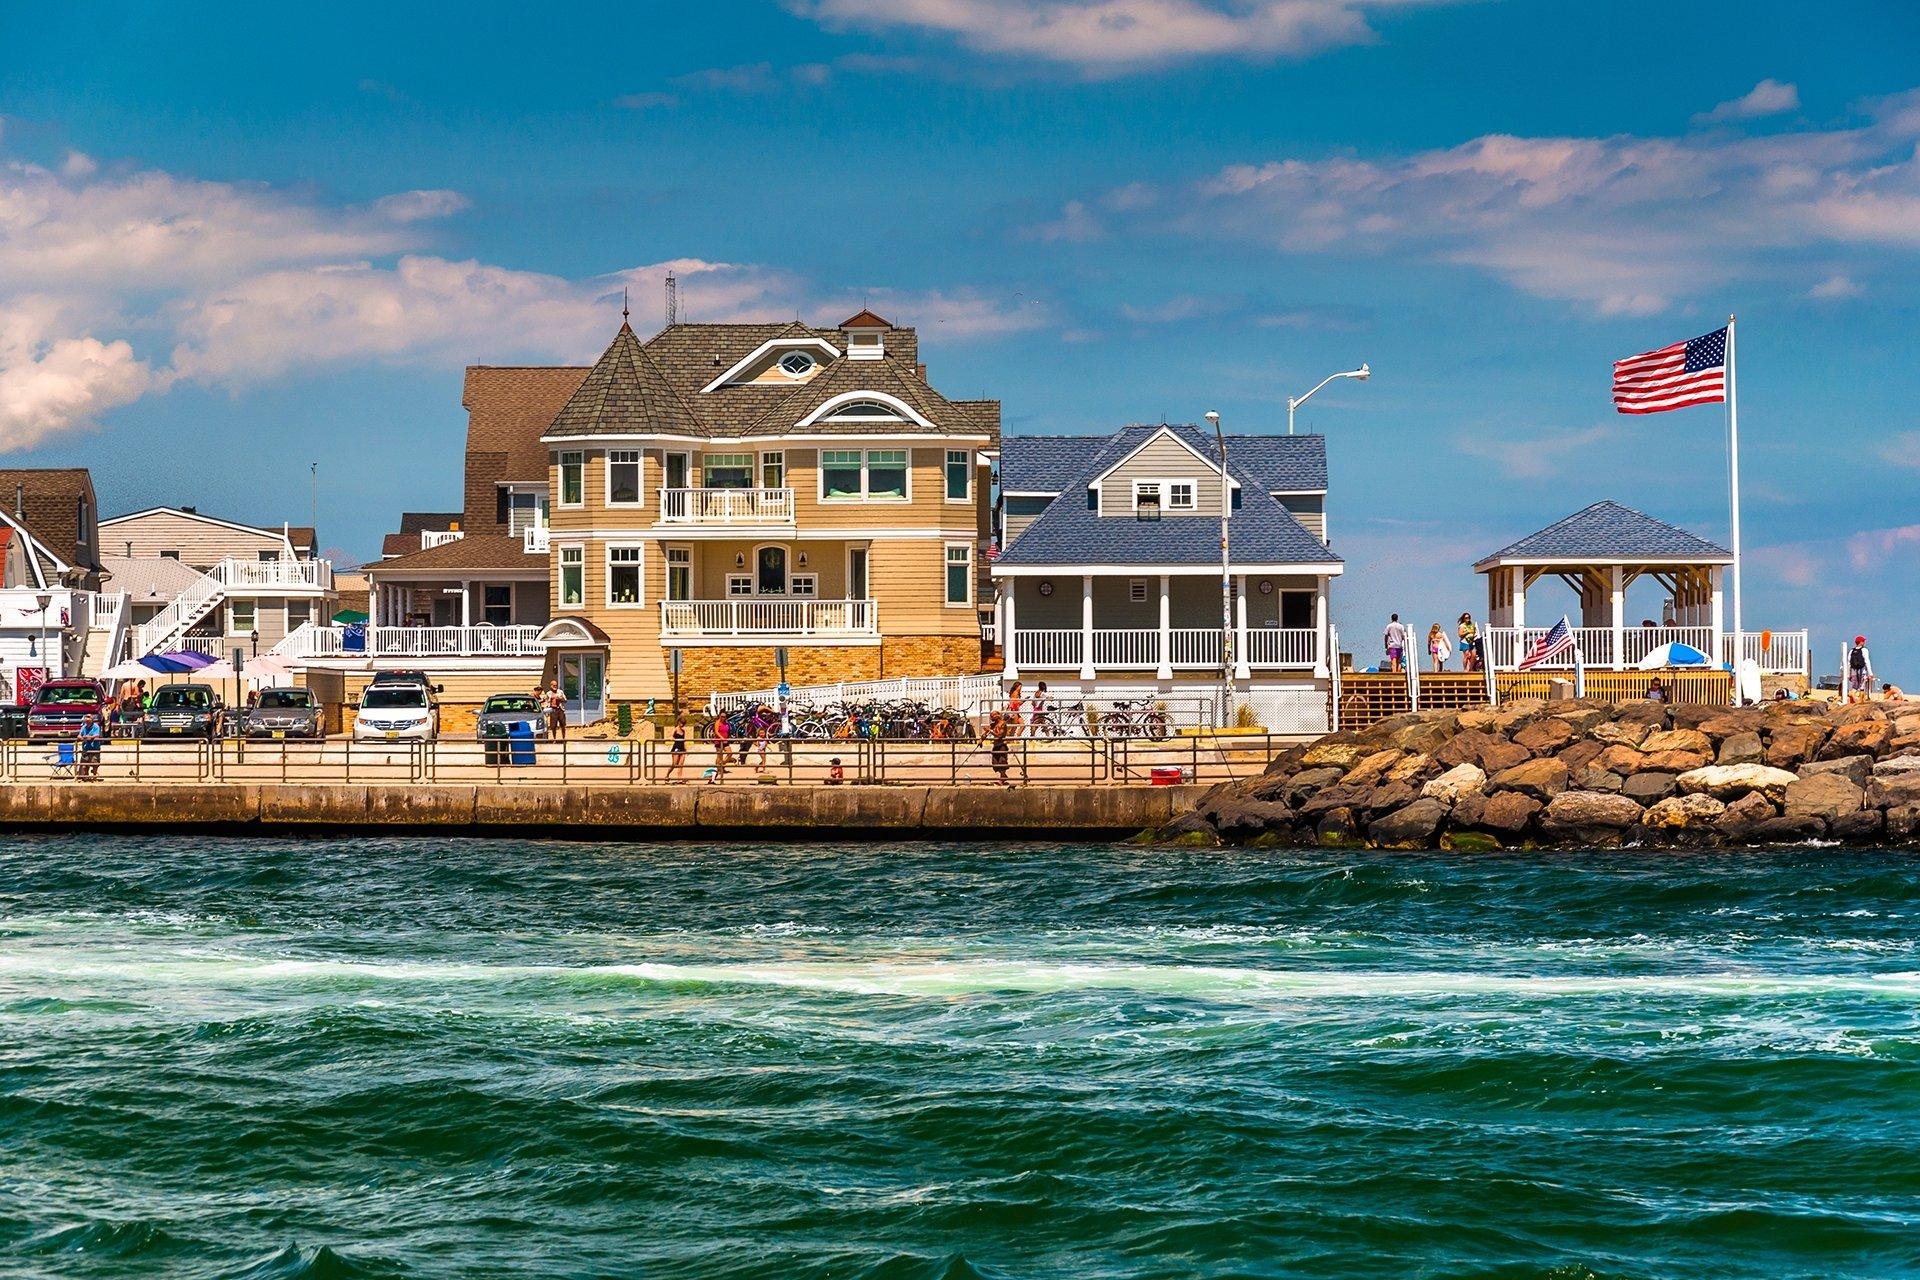 10 Elegant East Coast Summer Vacation Ideas 10 best east coast beach rental destinations for families family 7 2020